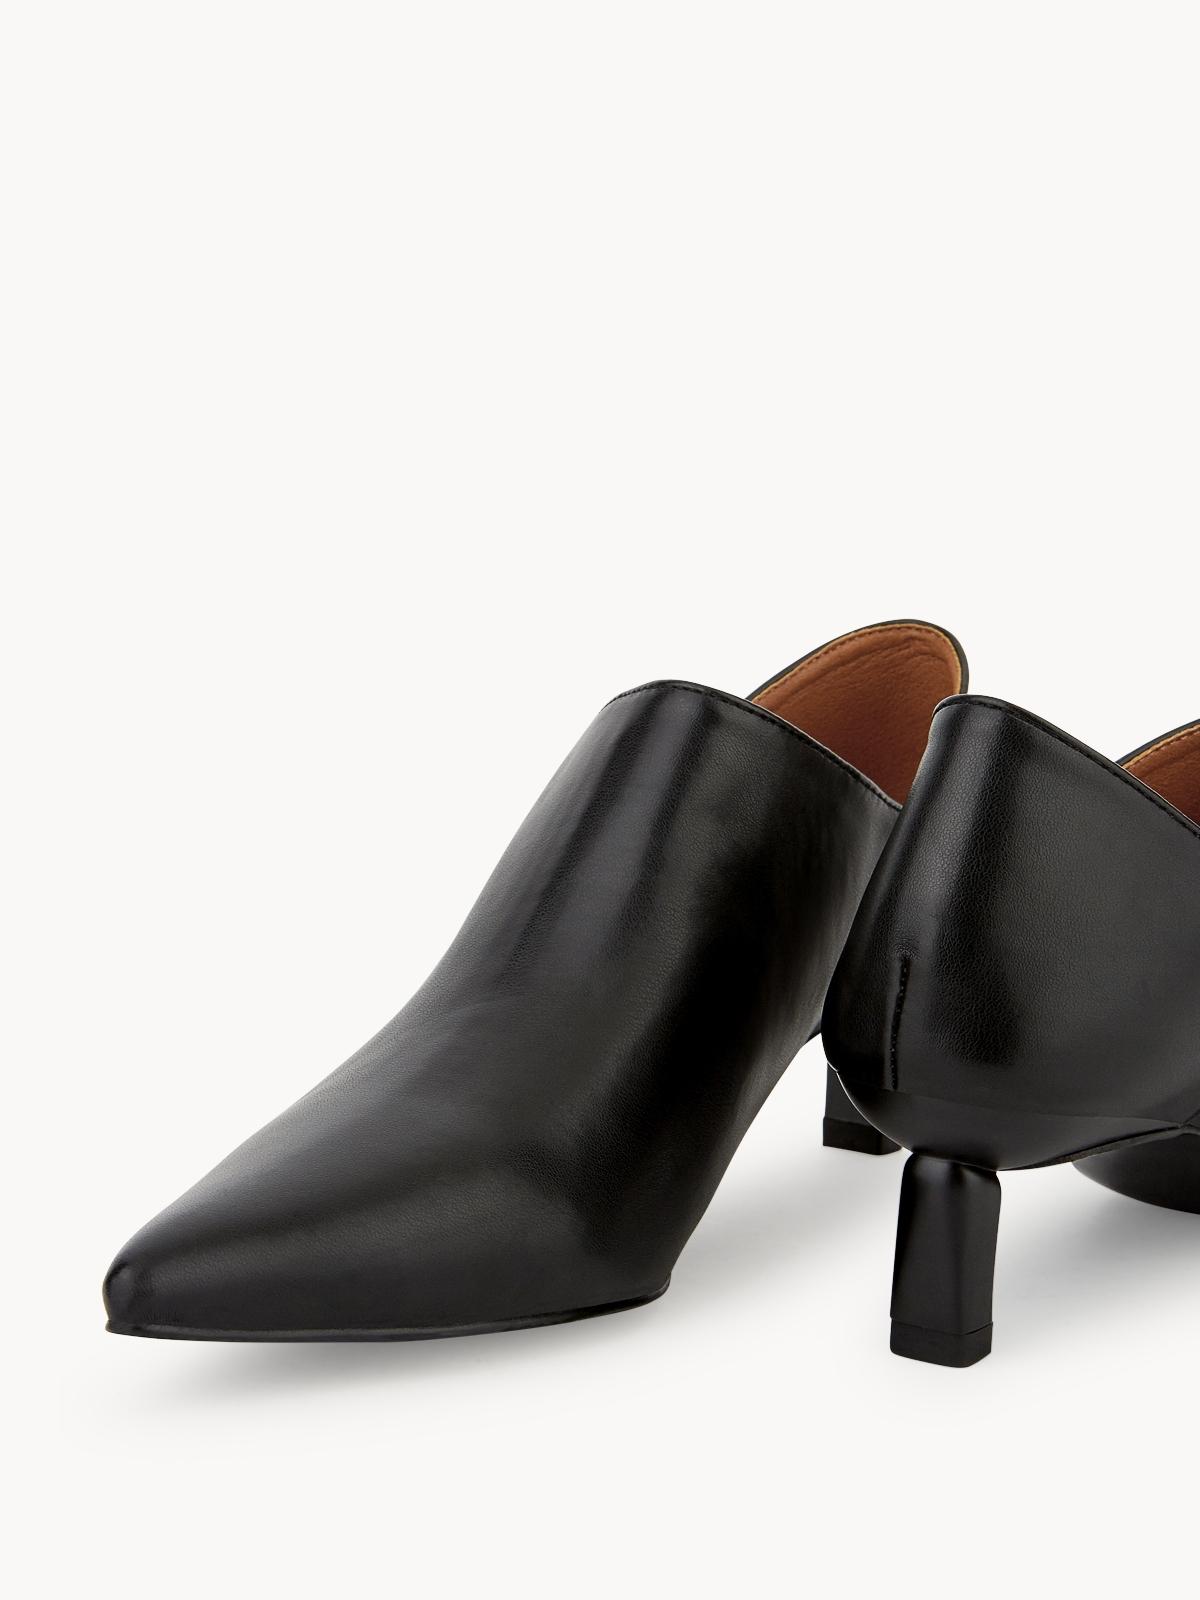 Starkela Low Ankle Boots Black